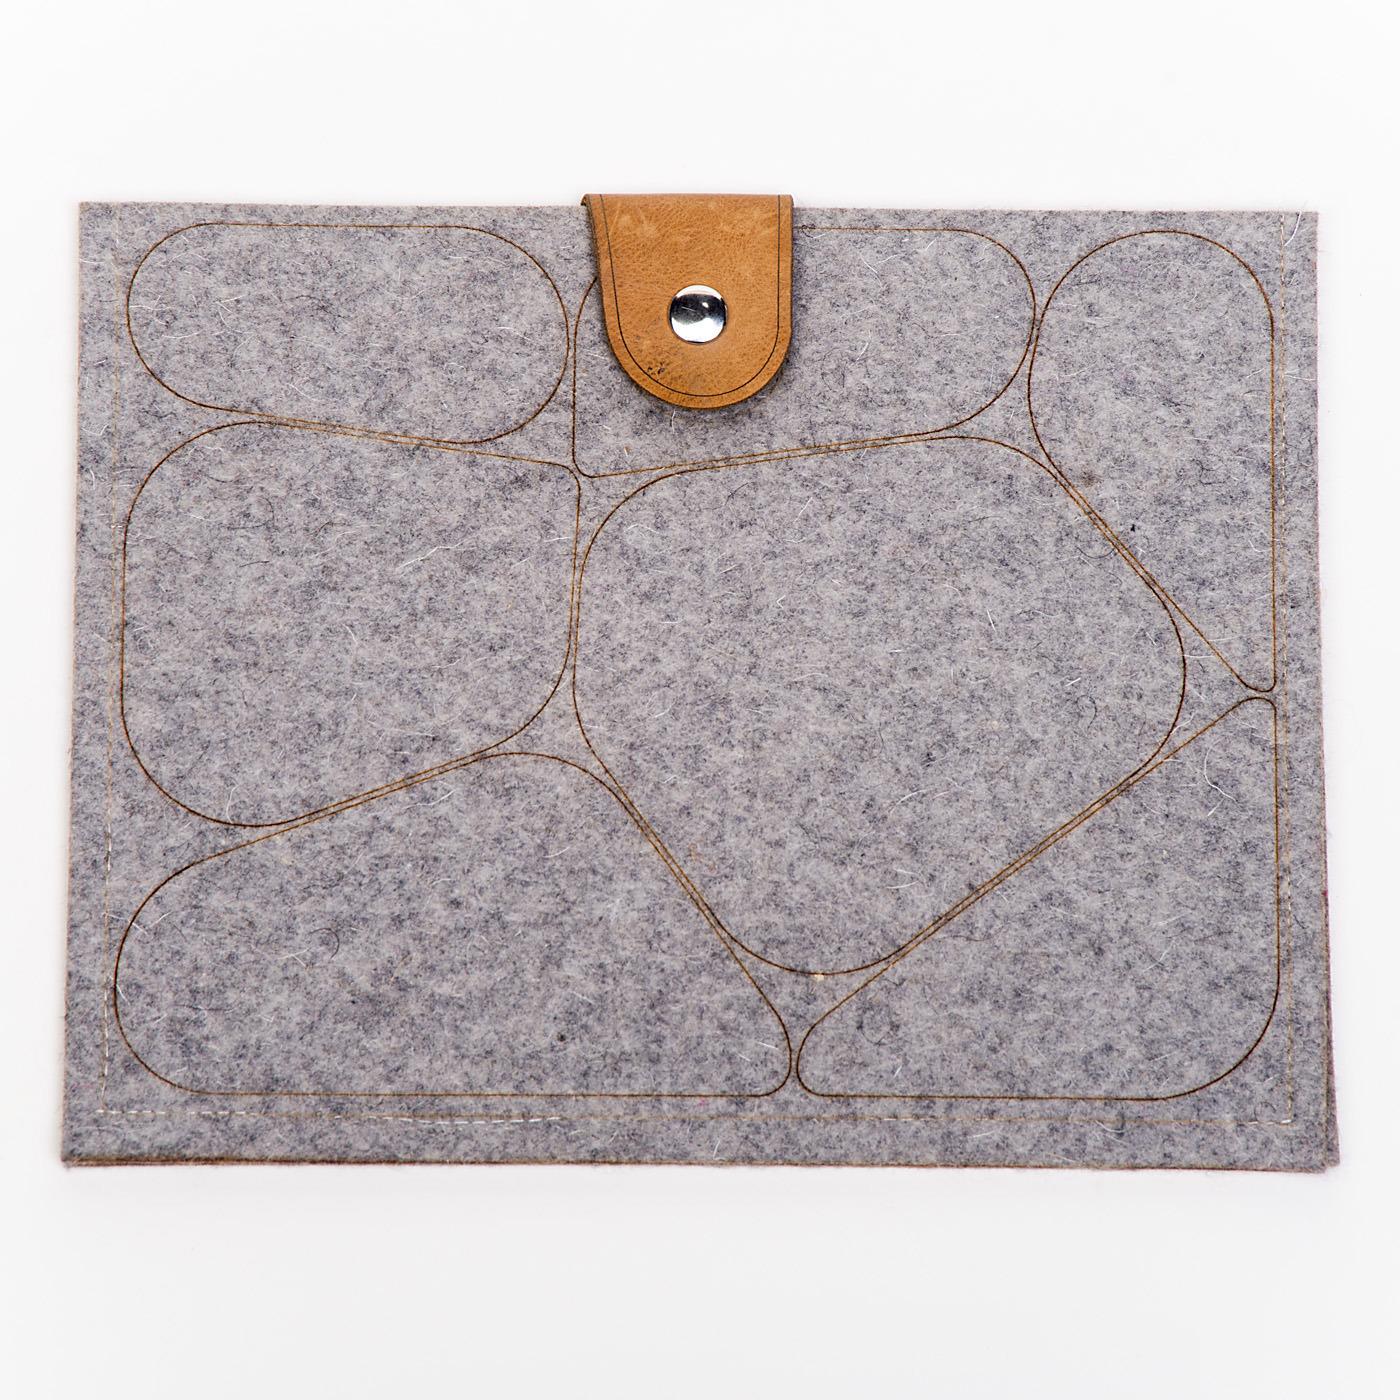 Artisan, Eco-Friendly, Designer Cobblestone iPad Case